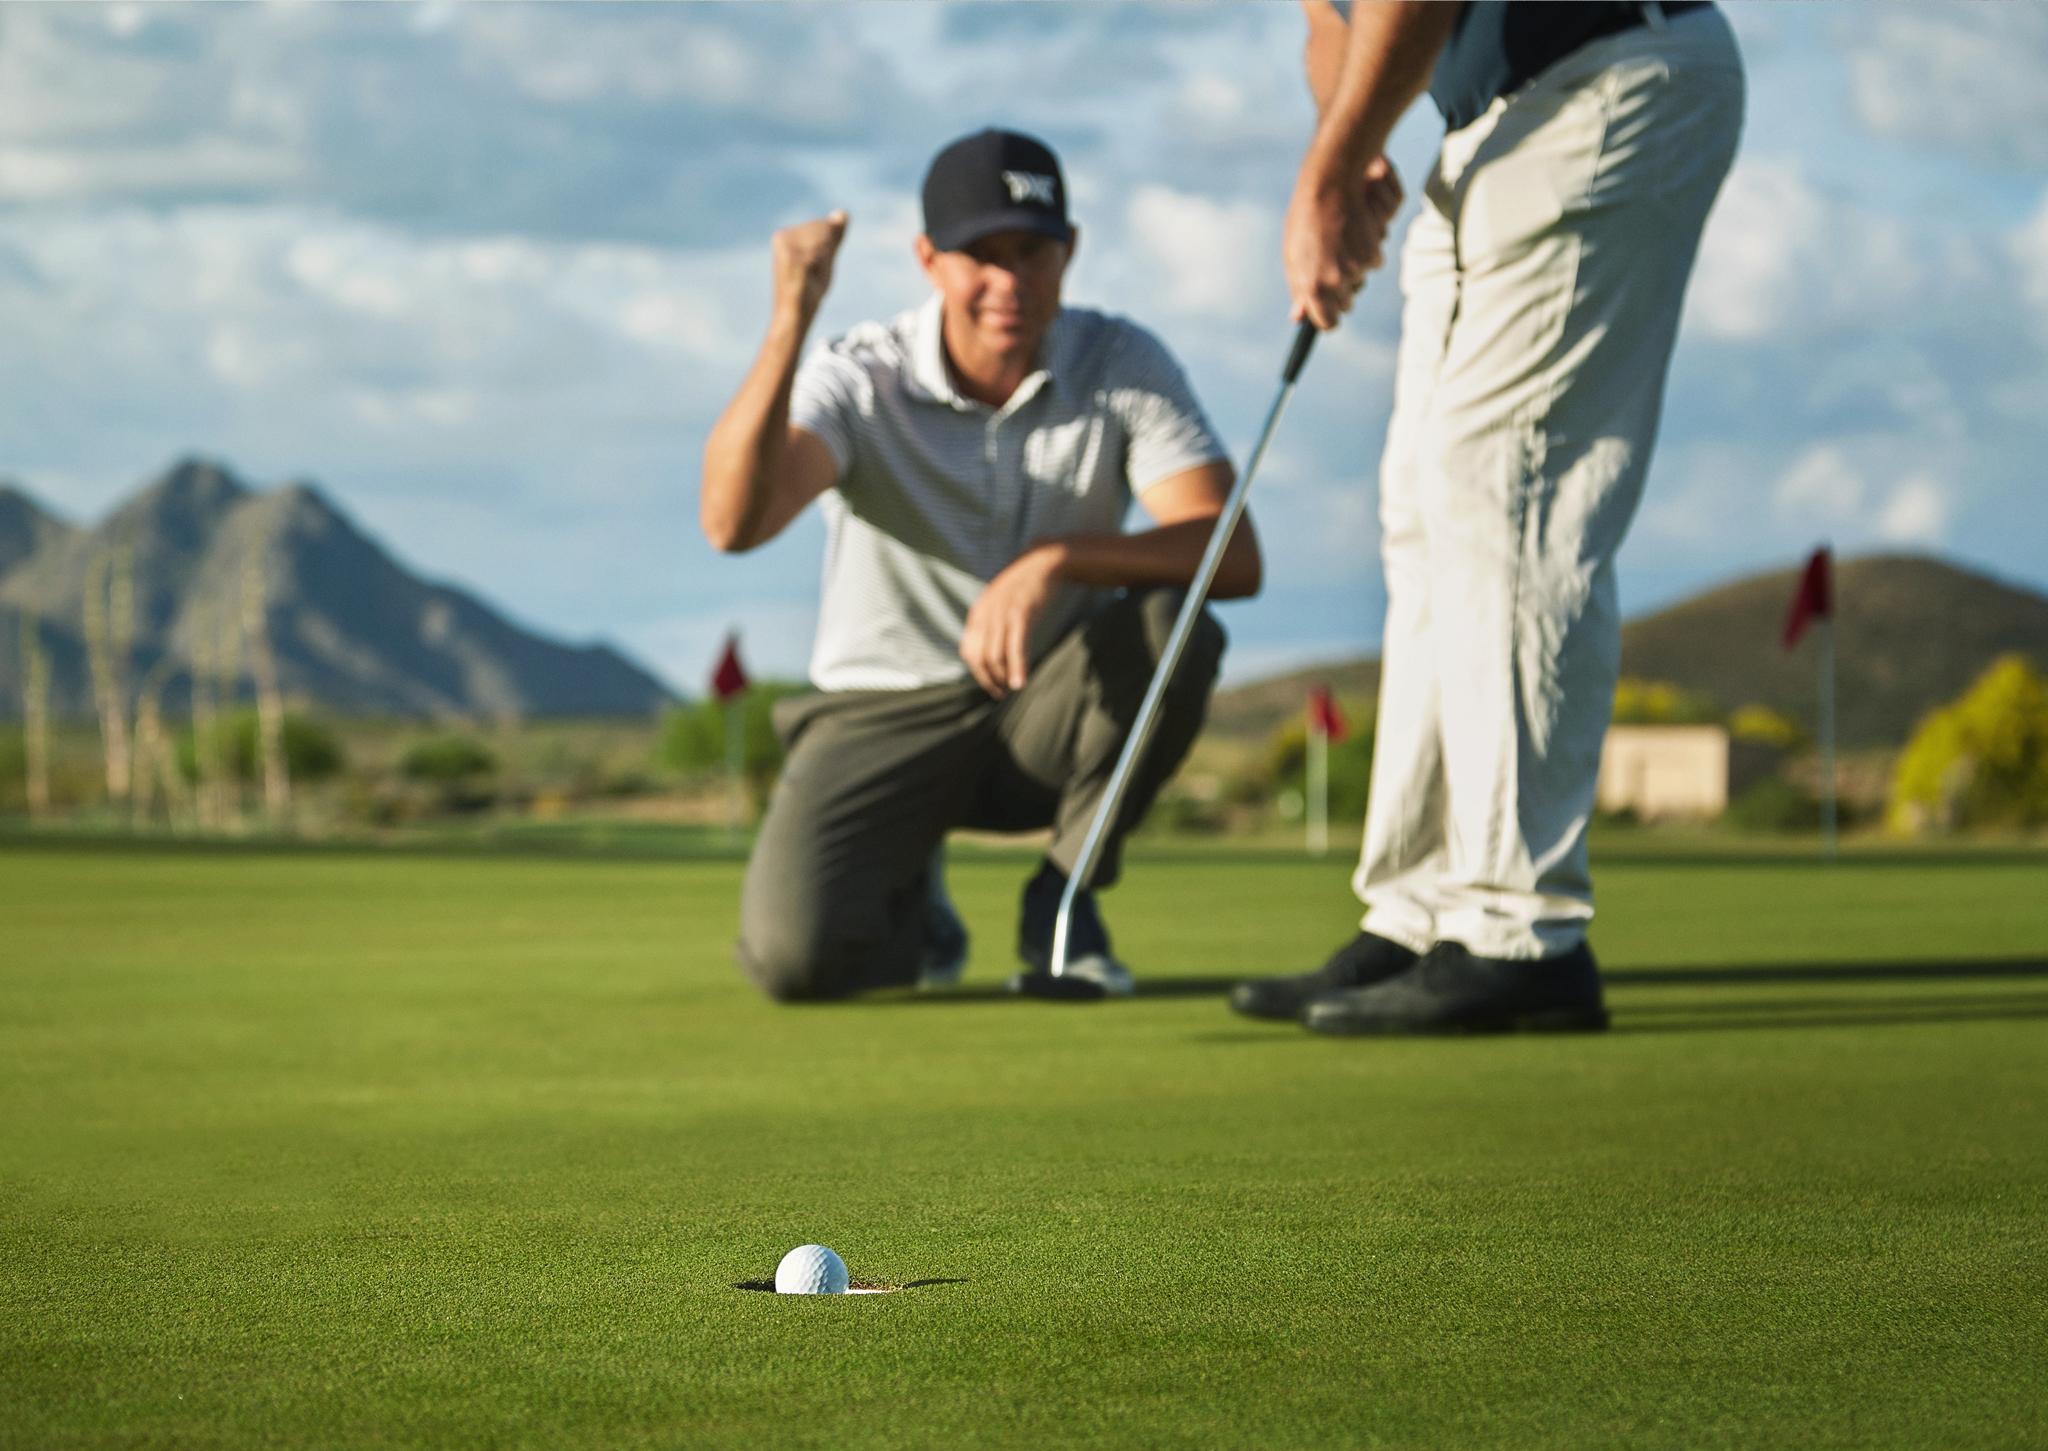 2016_Brandon-Tigrett_Scottsdale_Gabe-H_PGA_ImagesAZ-89_Retouched_WEB